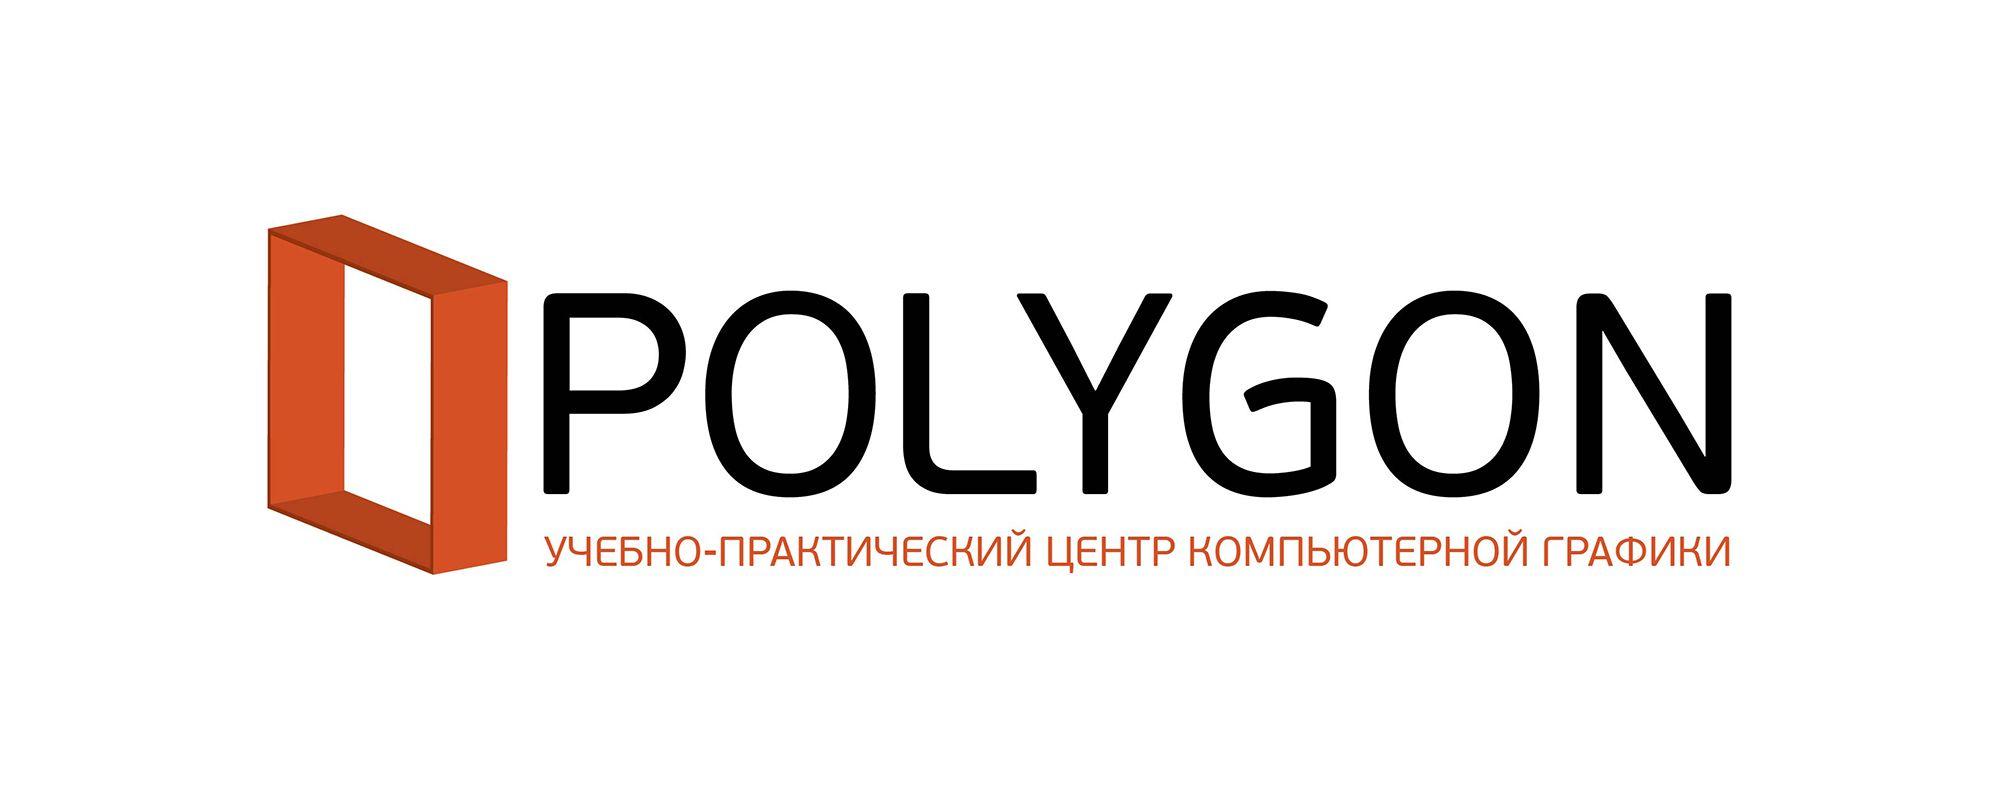 Логотип для учебного центра - дизайнер Scorpdiz